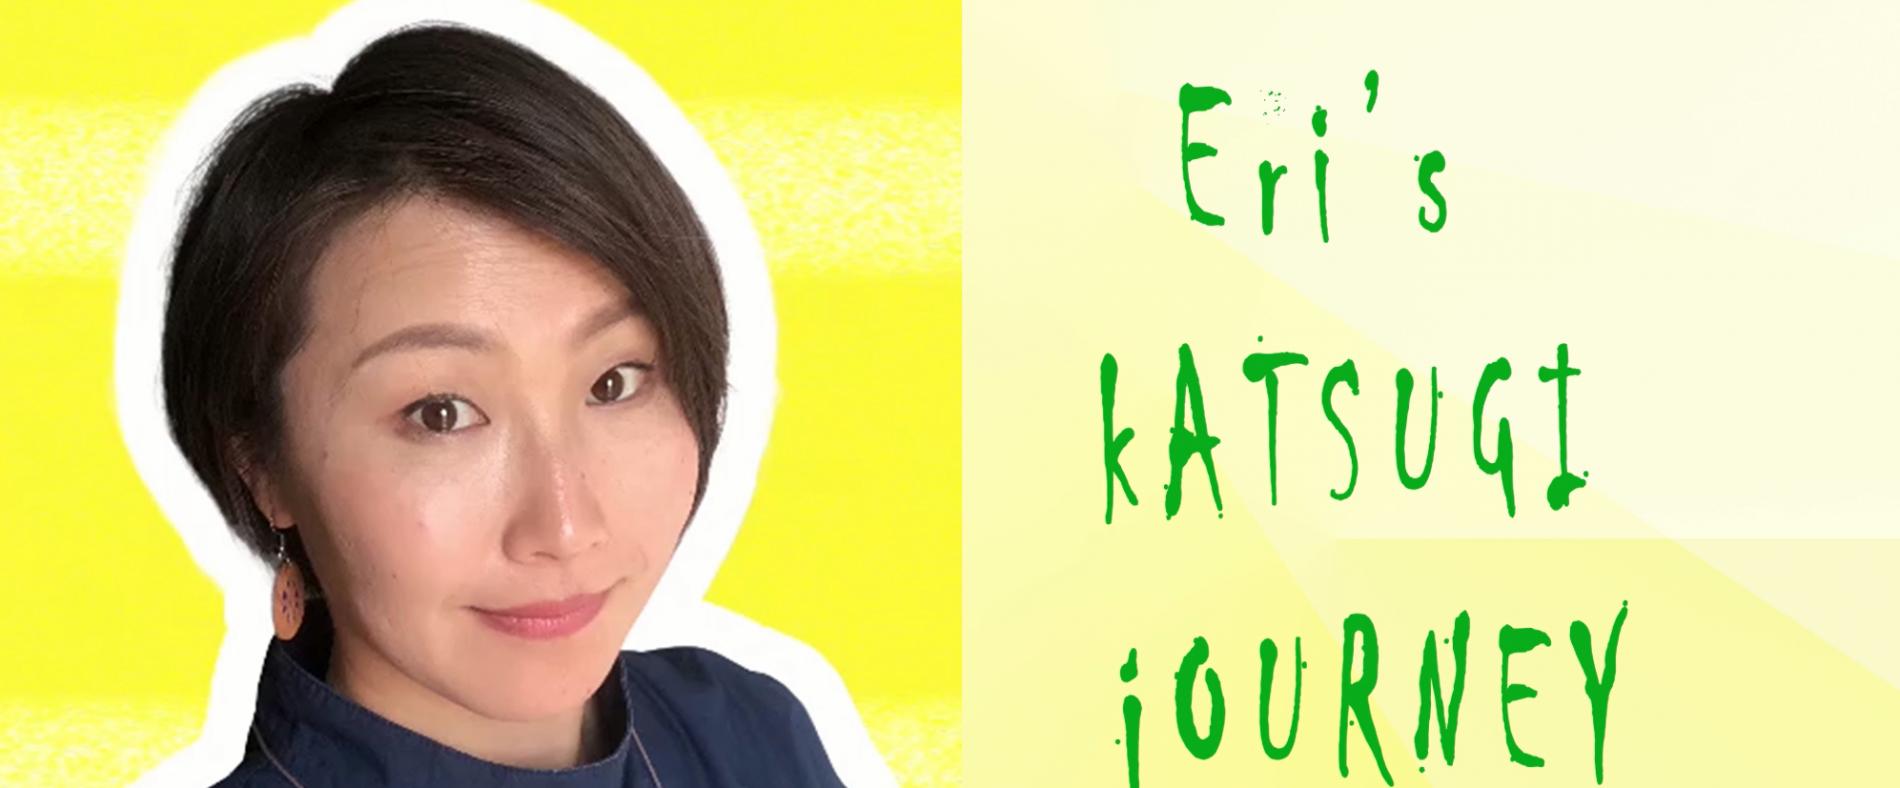 Eri Katsugi Title